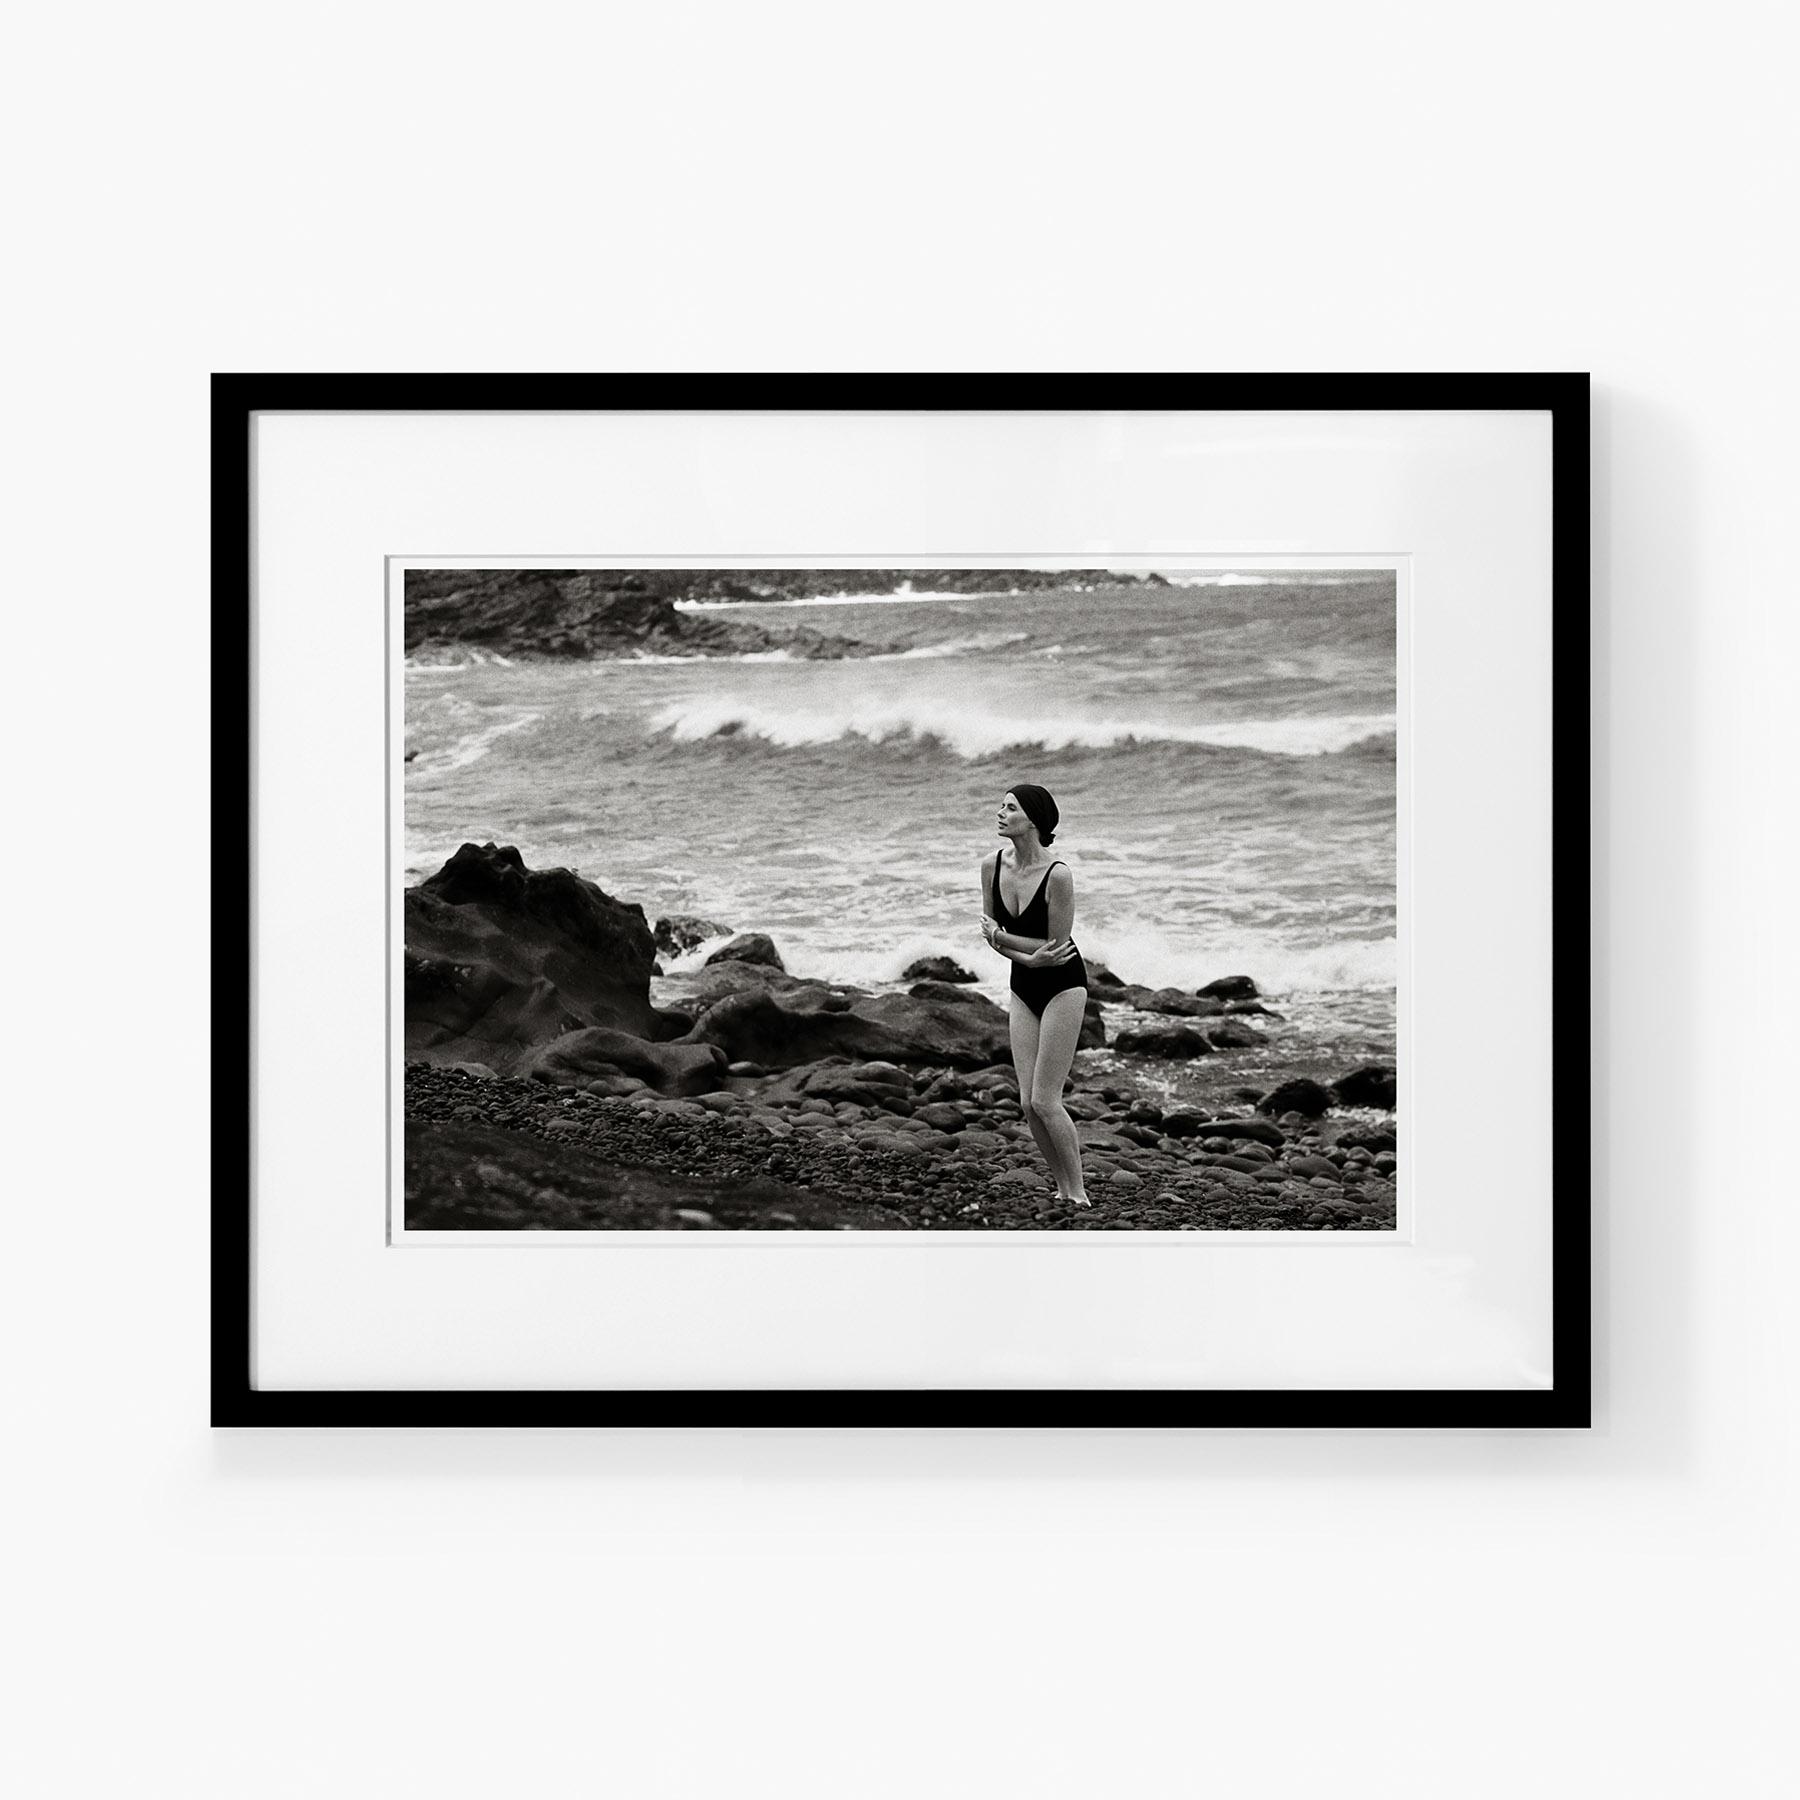 Tirage_Andre_Carrara_Claudia, 1991, Stromboli